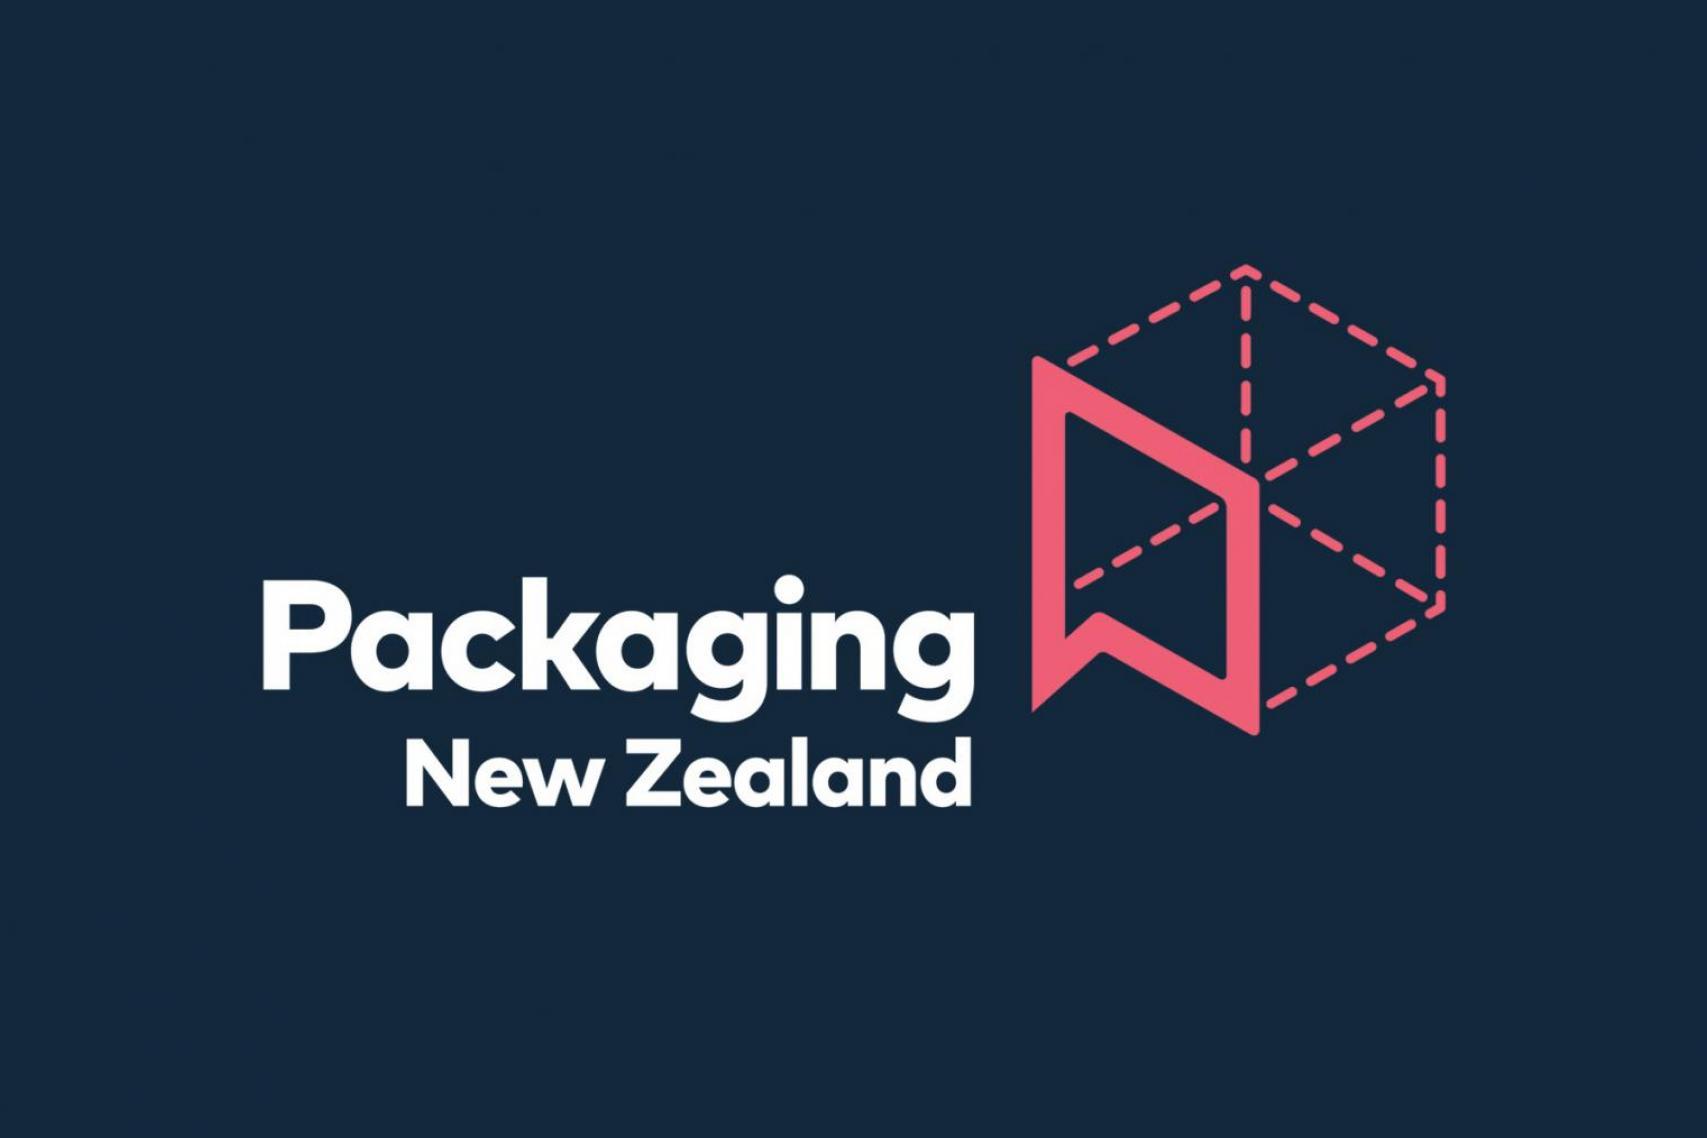 Saturday Creative Branding & Design Agency